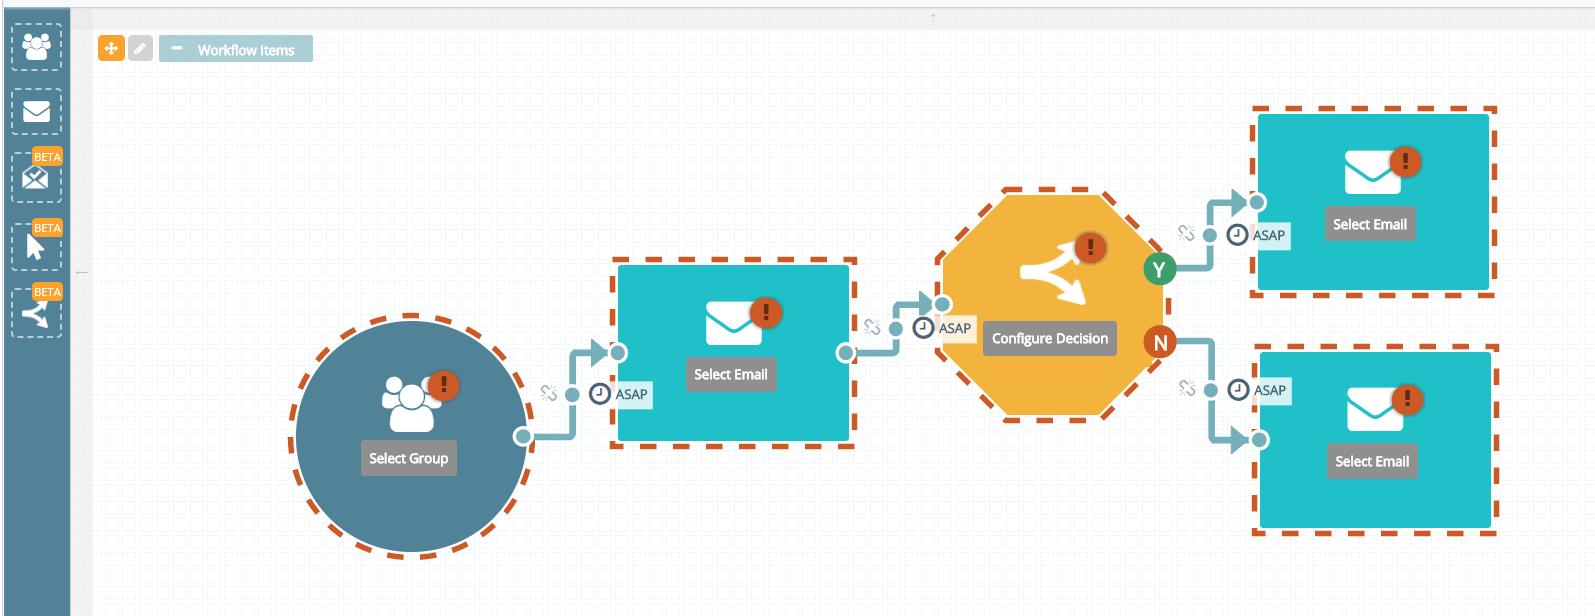 Placeholder Workflow